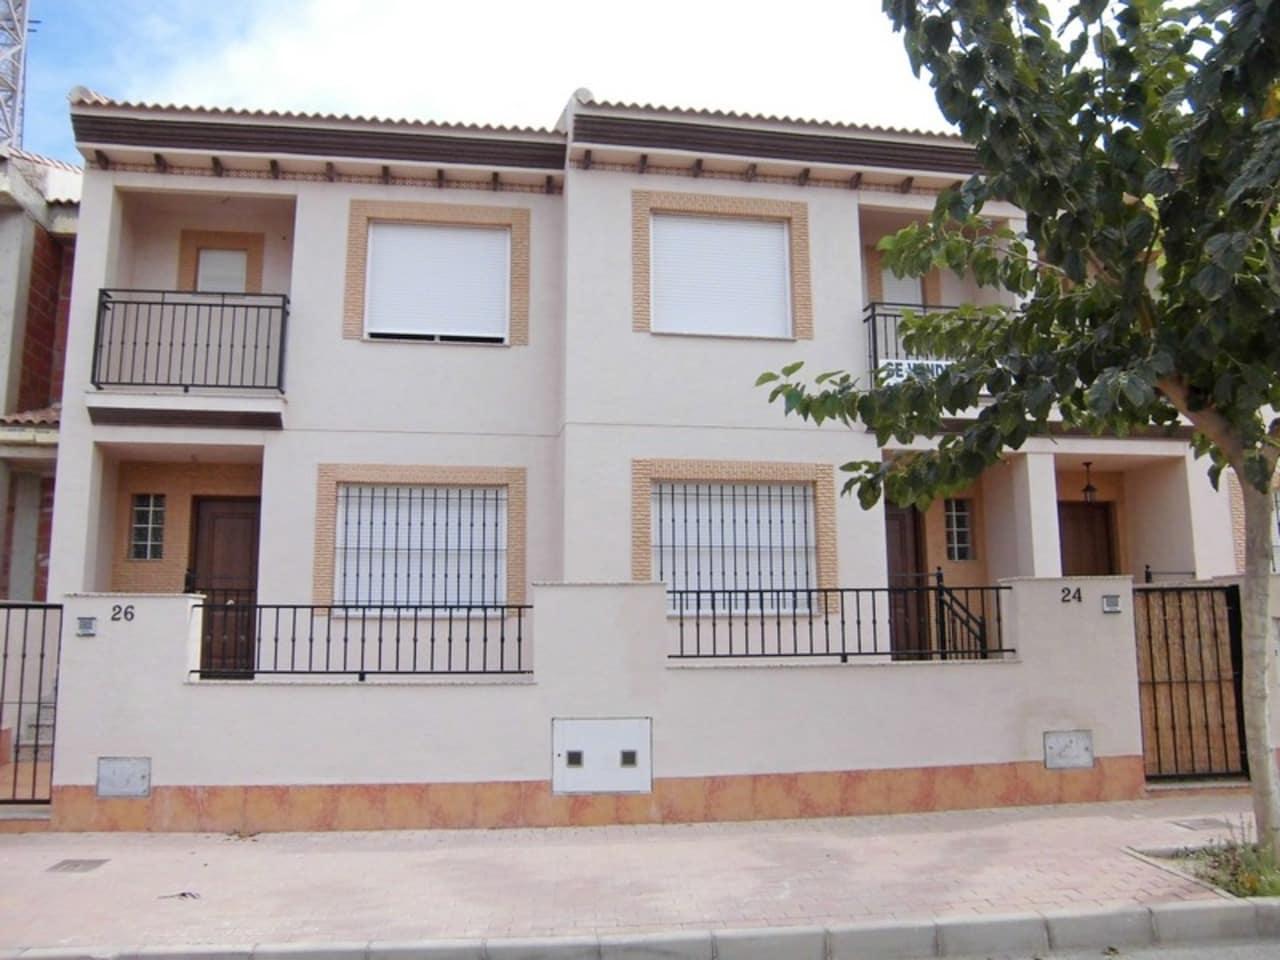 3 bedroom Townhouse for sale in San Pedro del Pinatar - € 165,000 (Ref: 5107334)